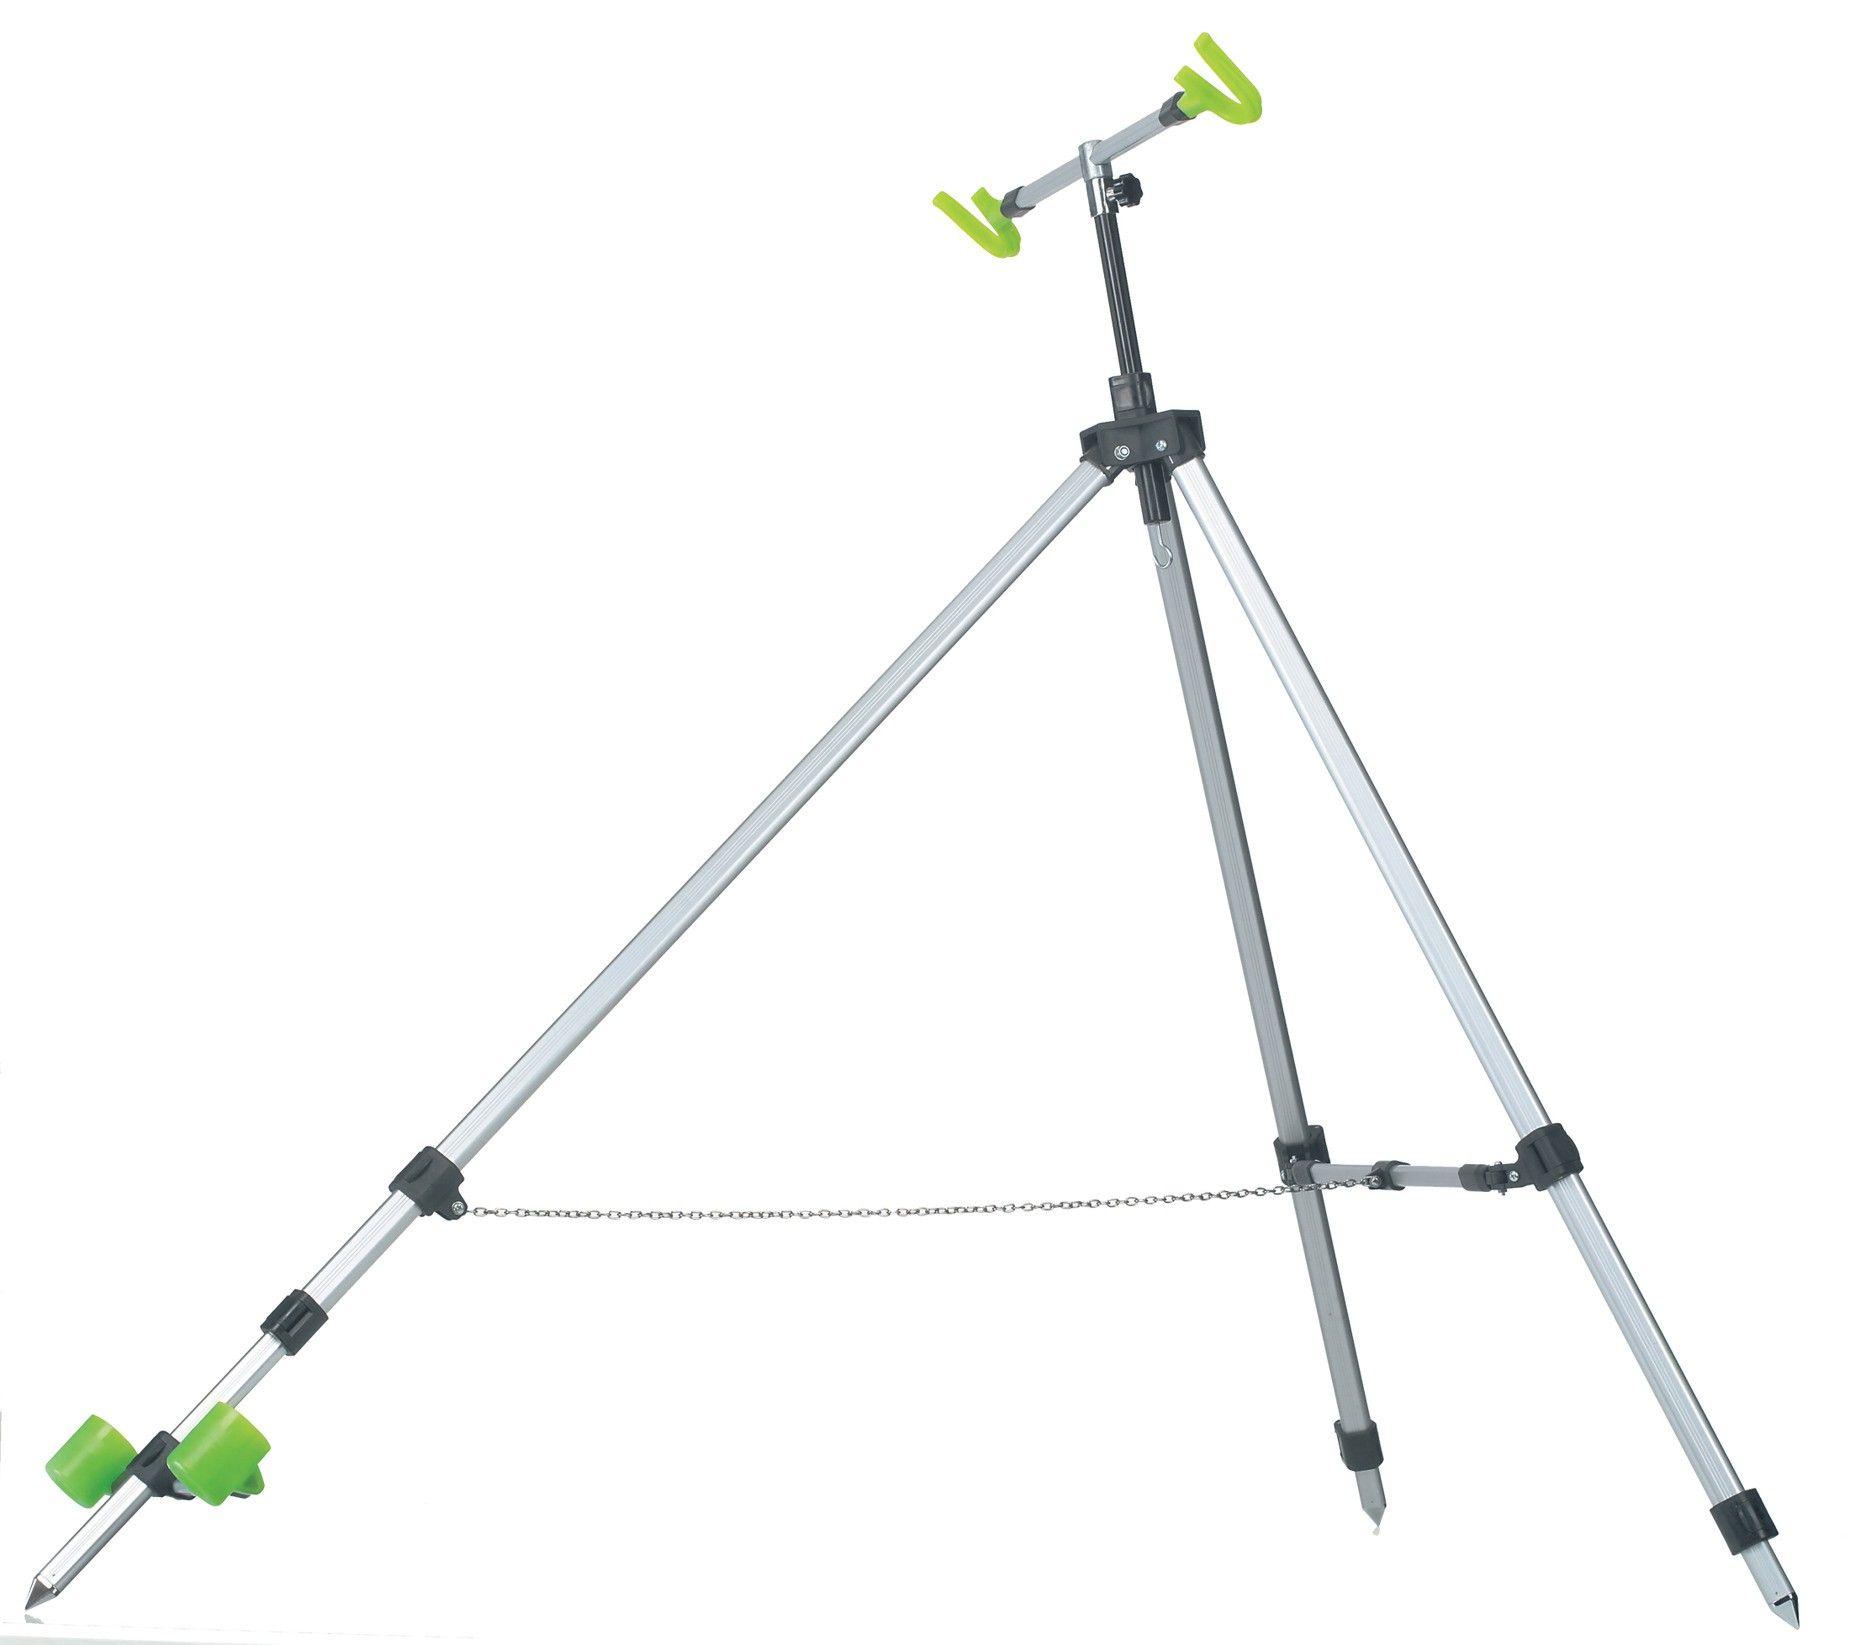 Volejbal teleskopický Stojan, do 180 cm